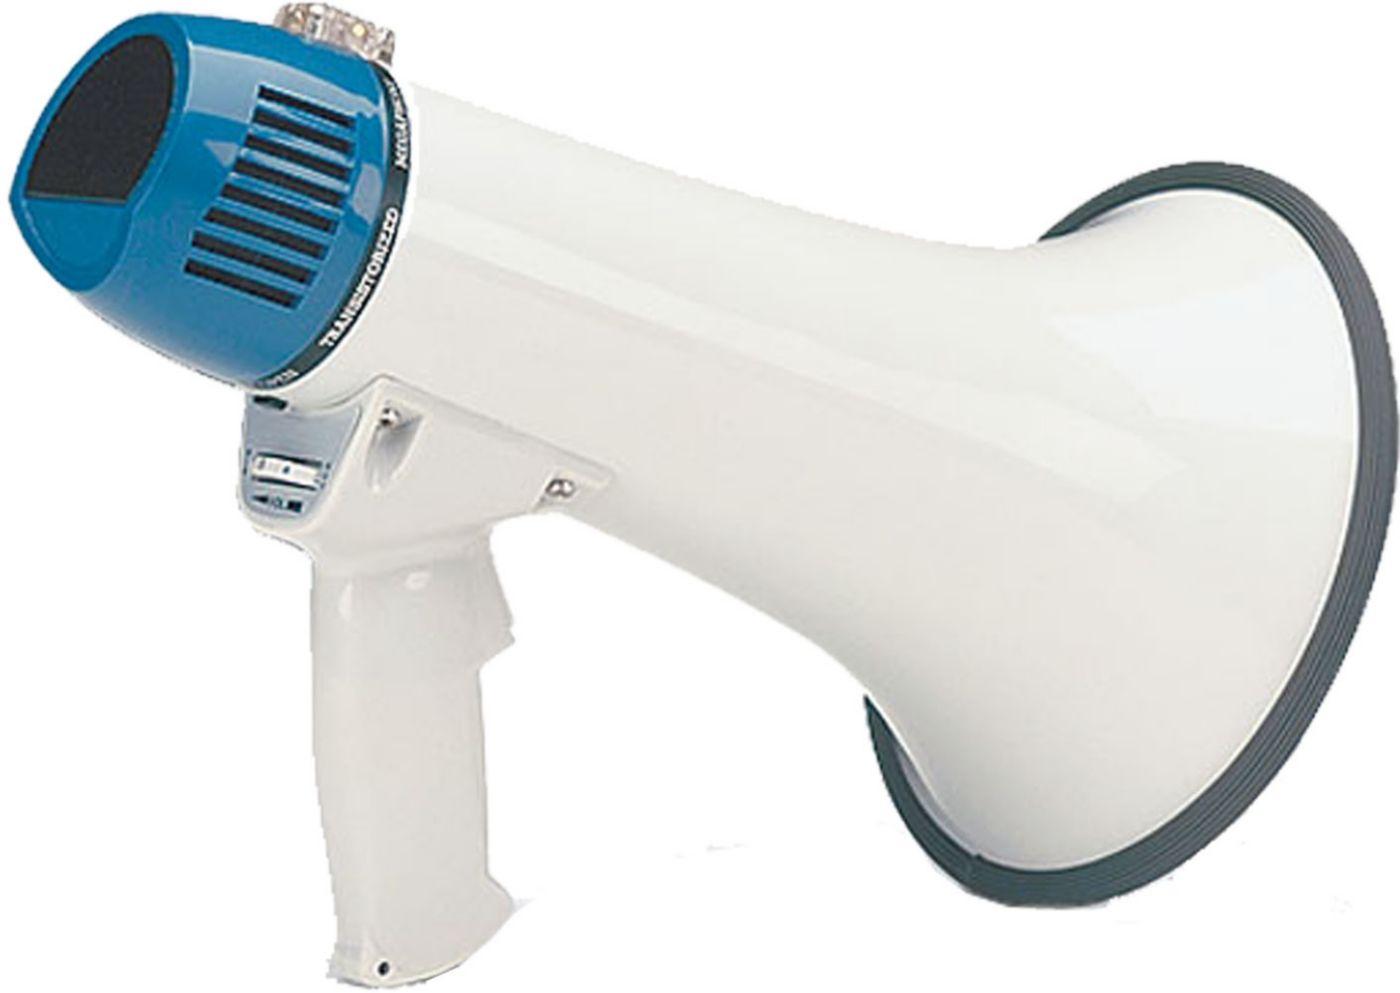 Gill 25 Watt Megaphone